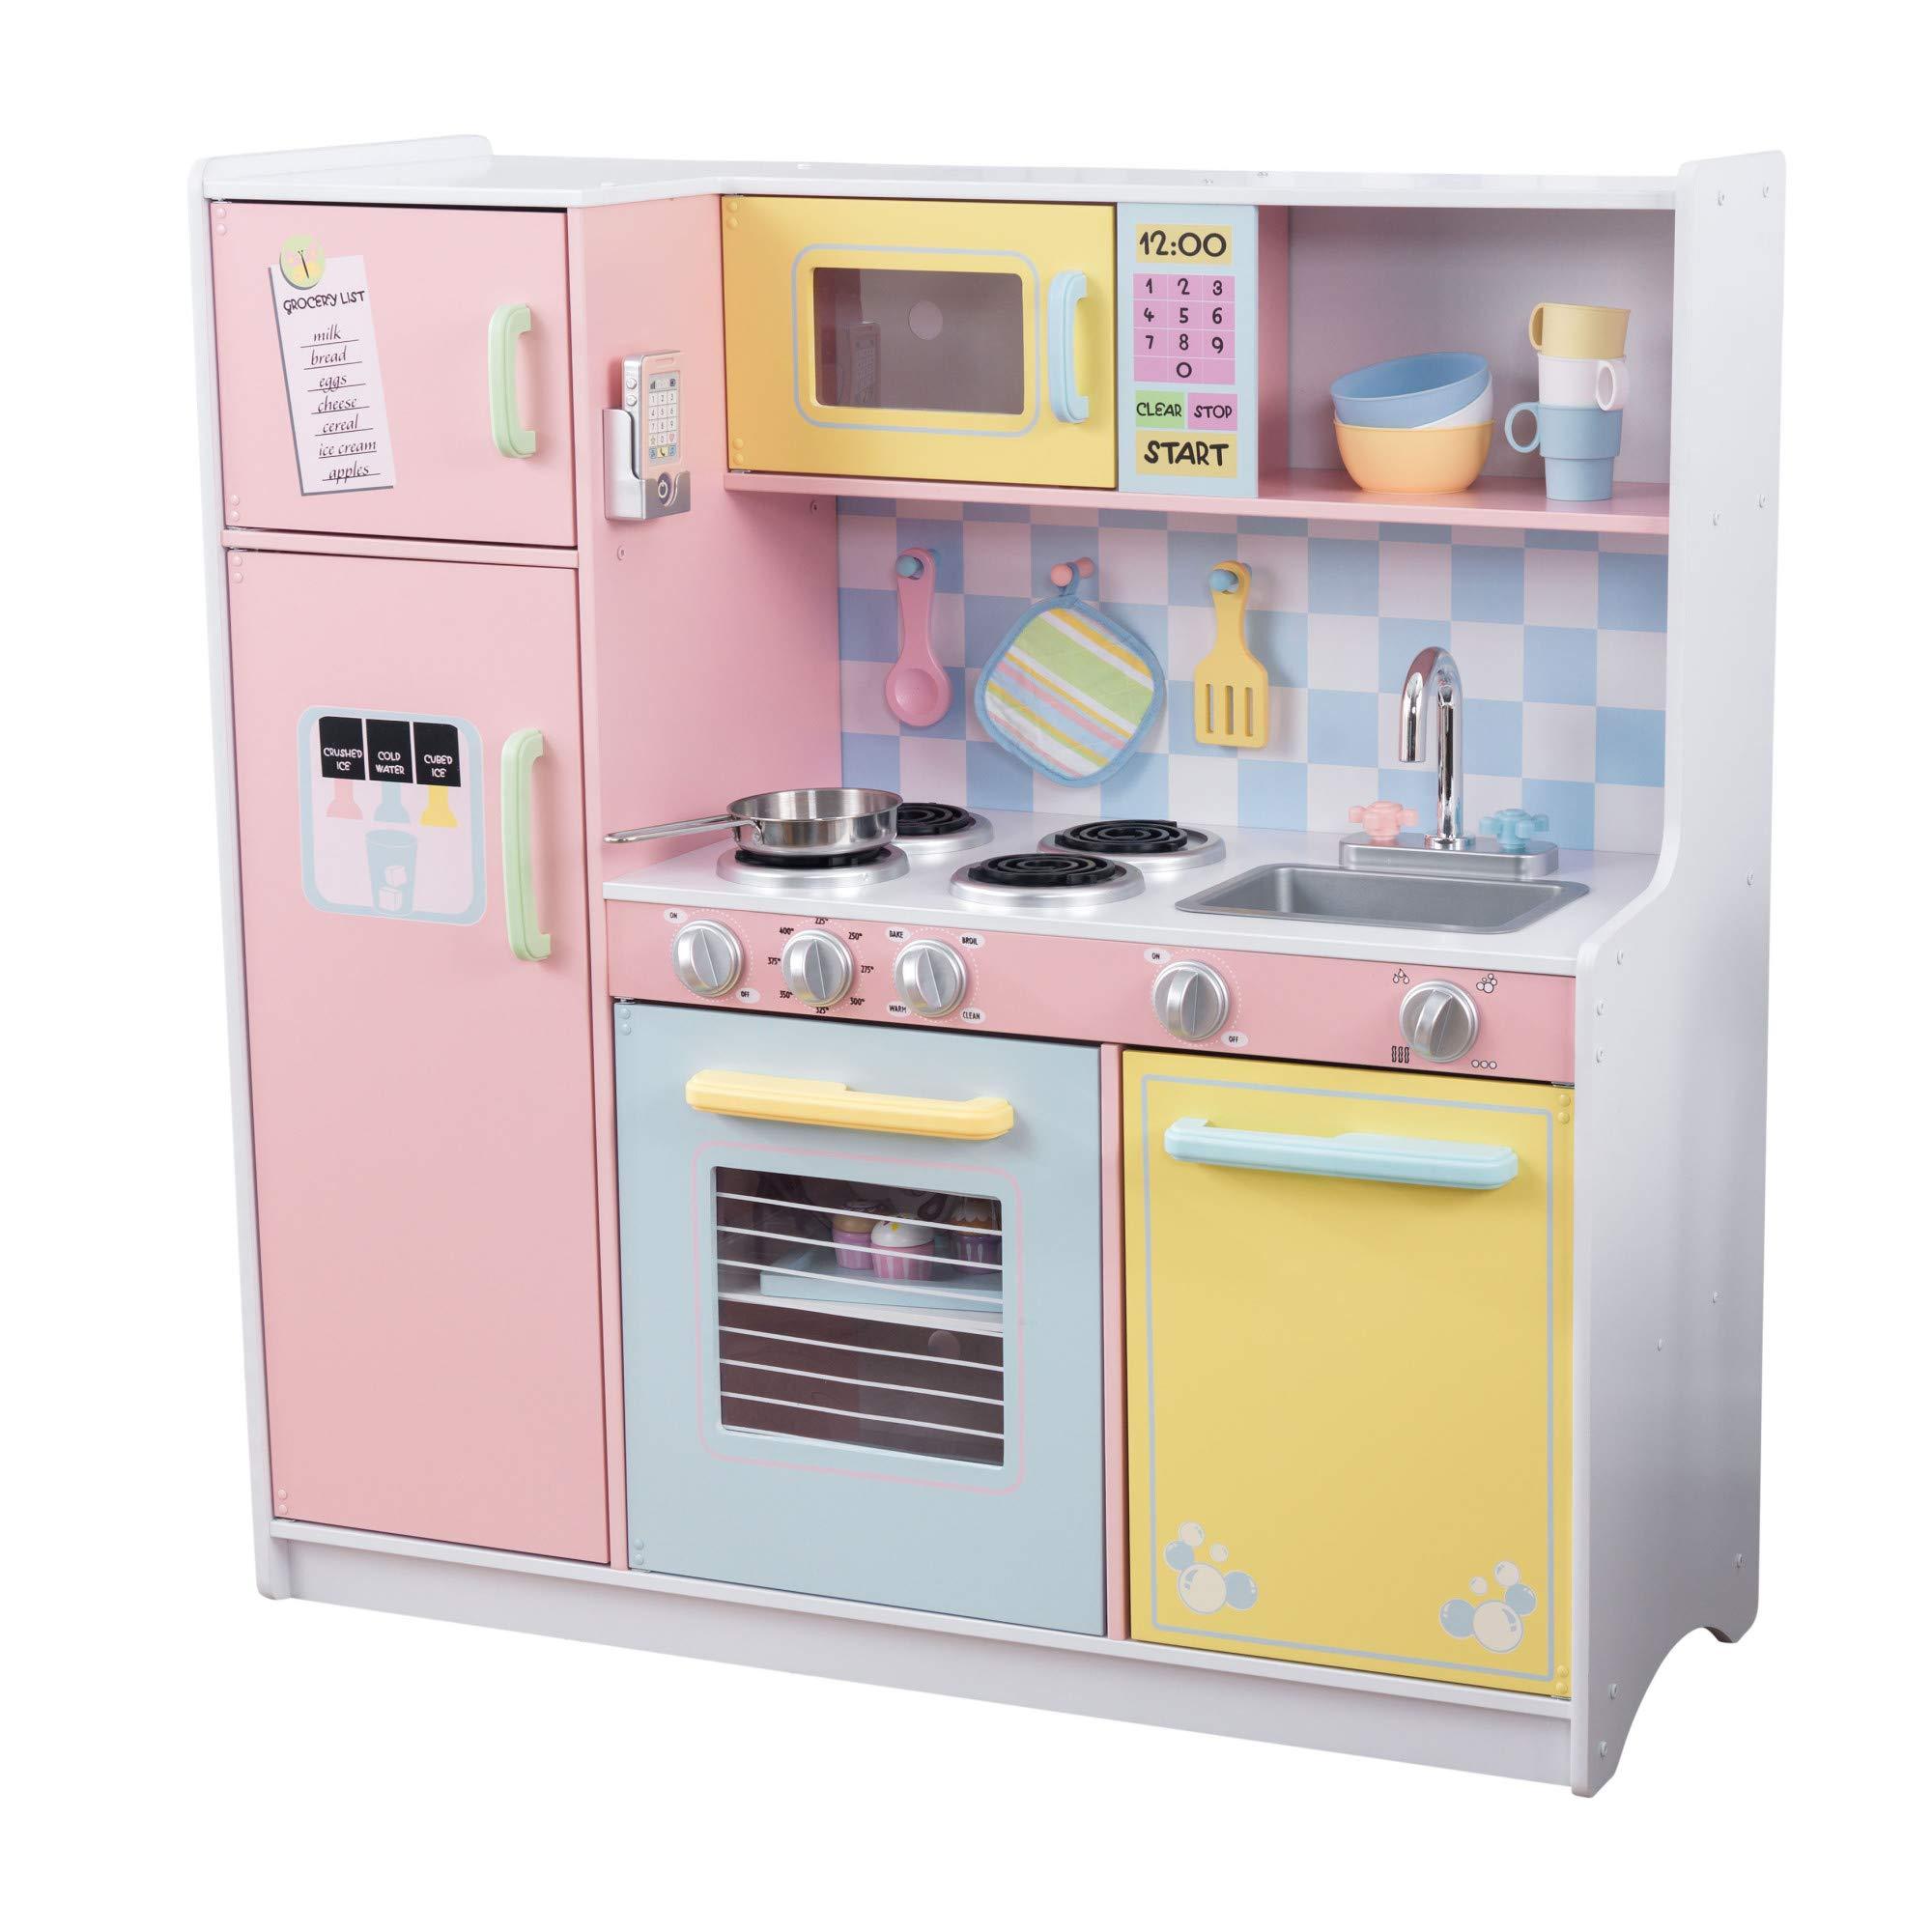 KidKraft Large Kitchen, Pastel, 42.30 x 17.60 x 43.00 Inches